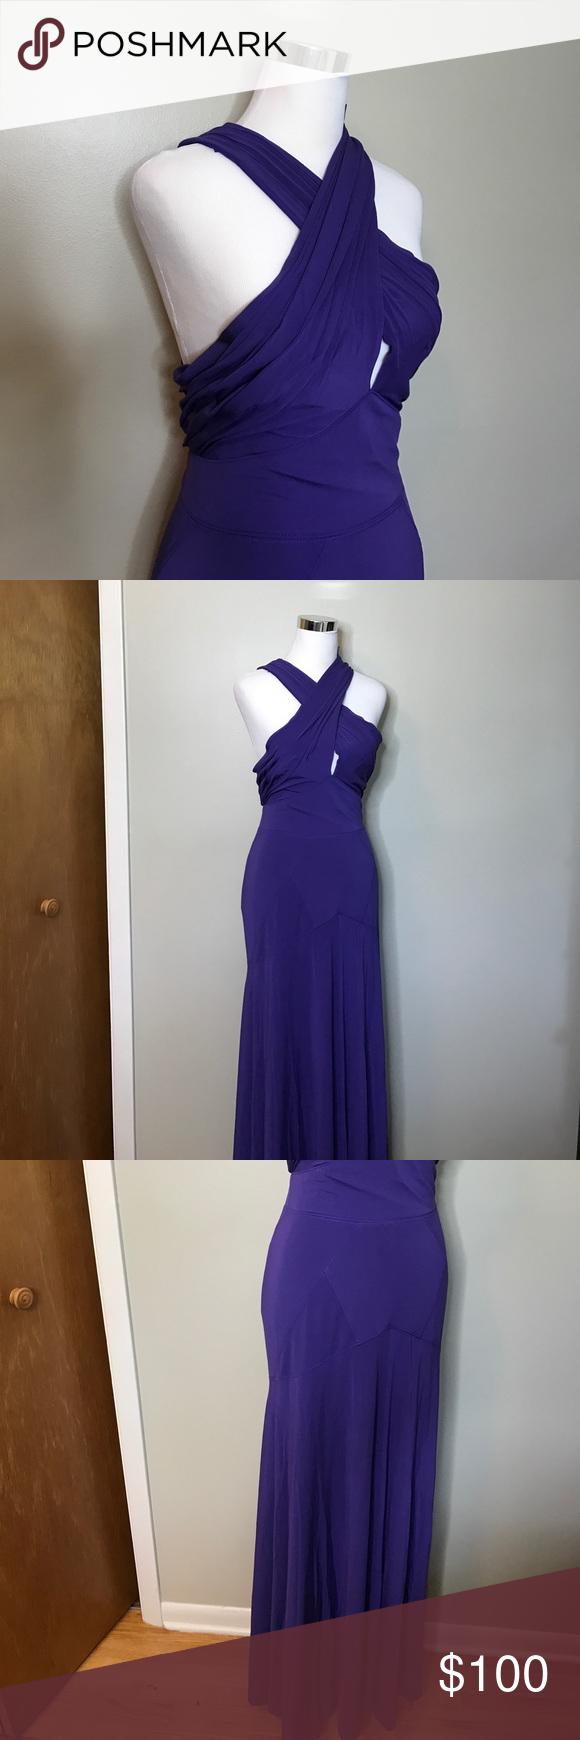 Bcbgmaxazria purple evening gown max dress purple evening gowns